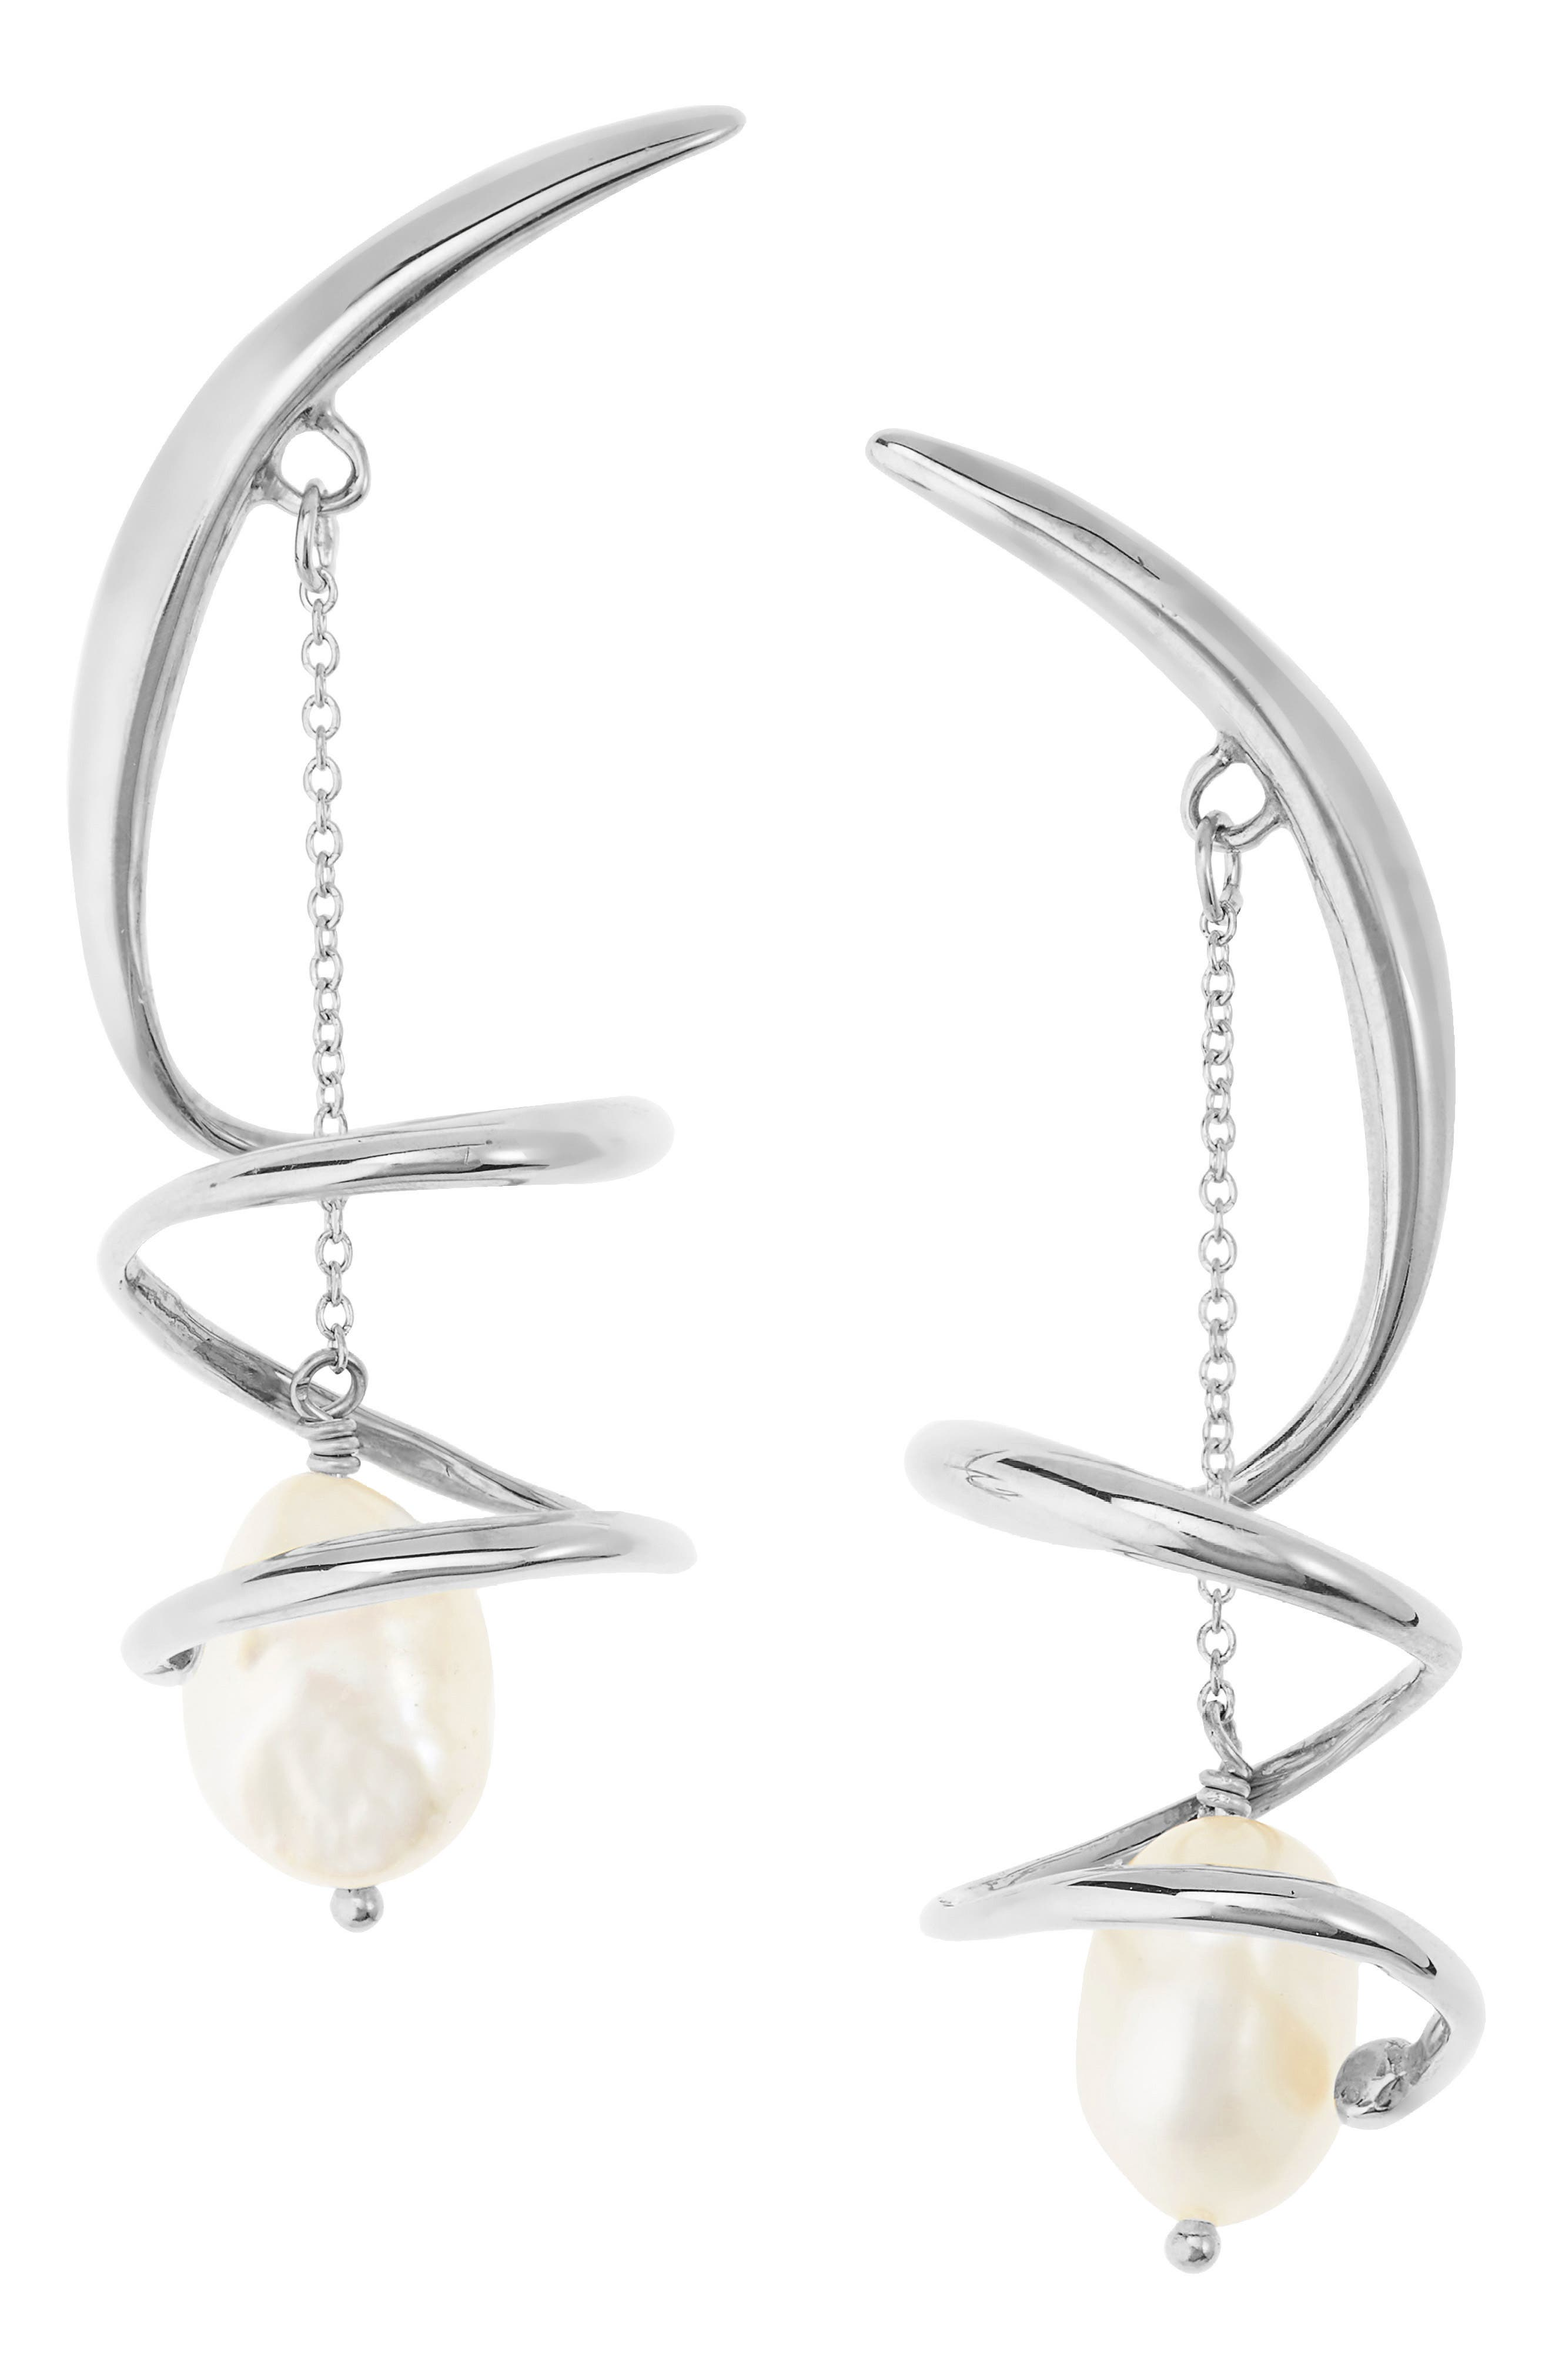 Pirouette Drop Earrings